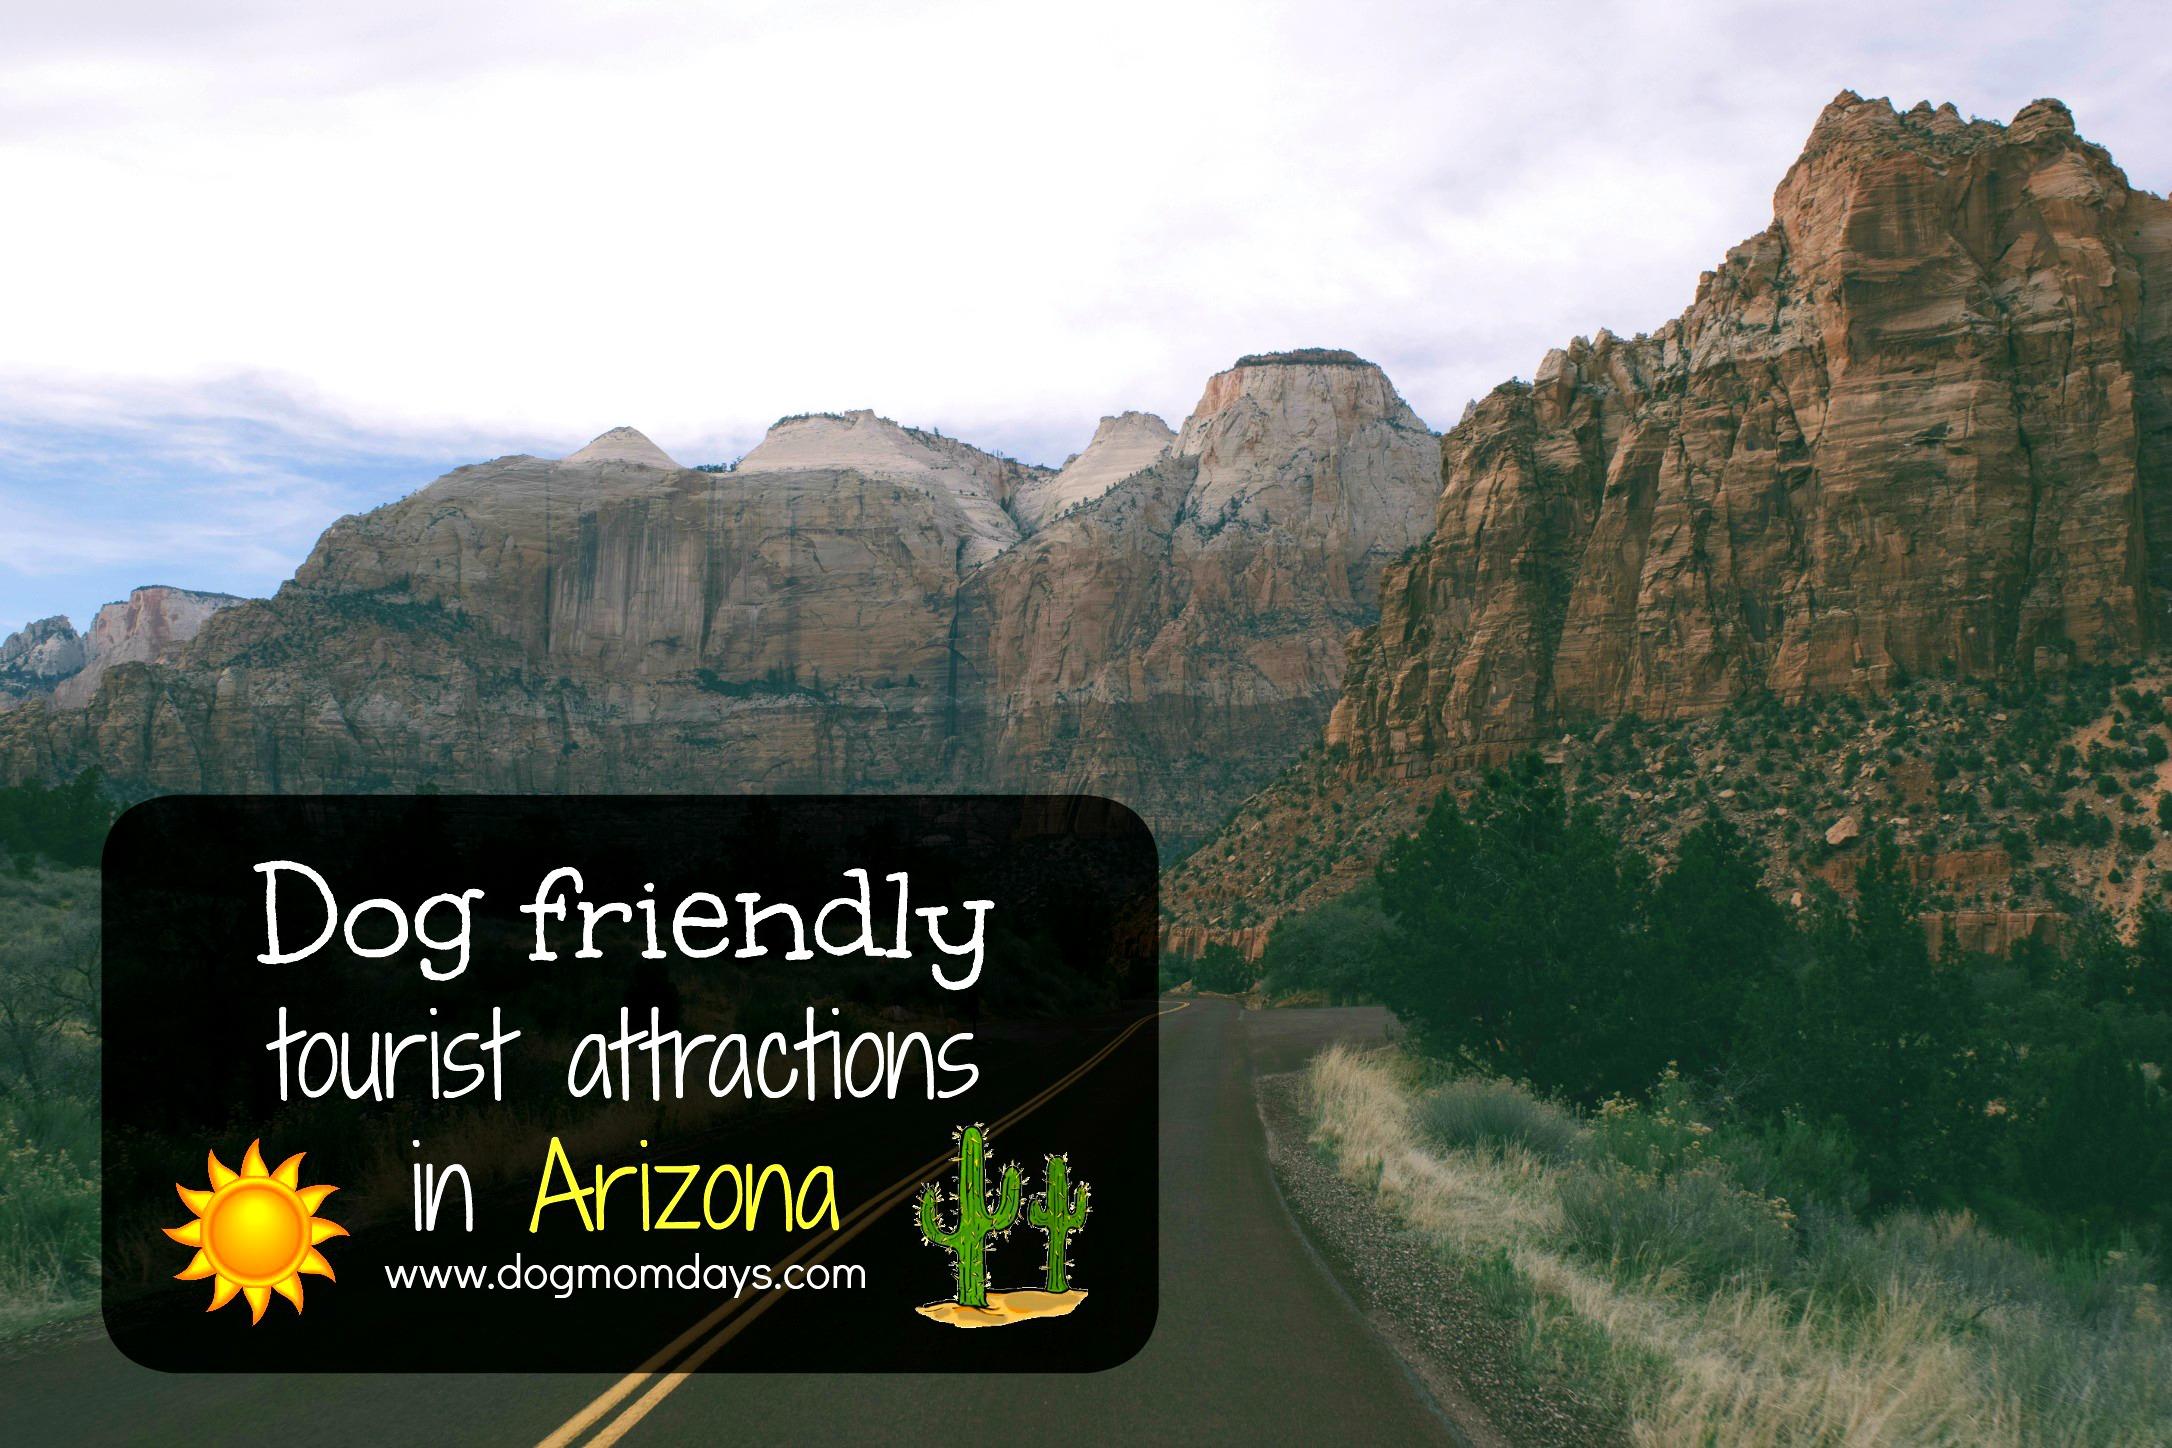 dog friendly tourist attractions in Arizona